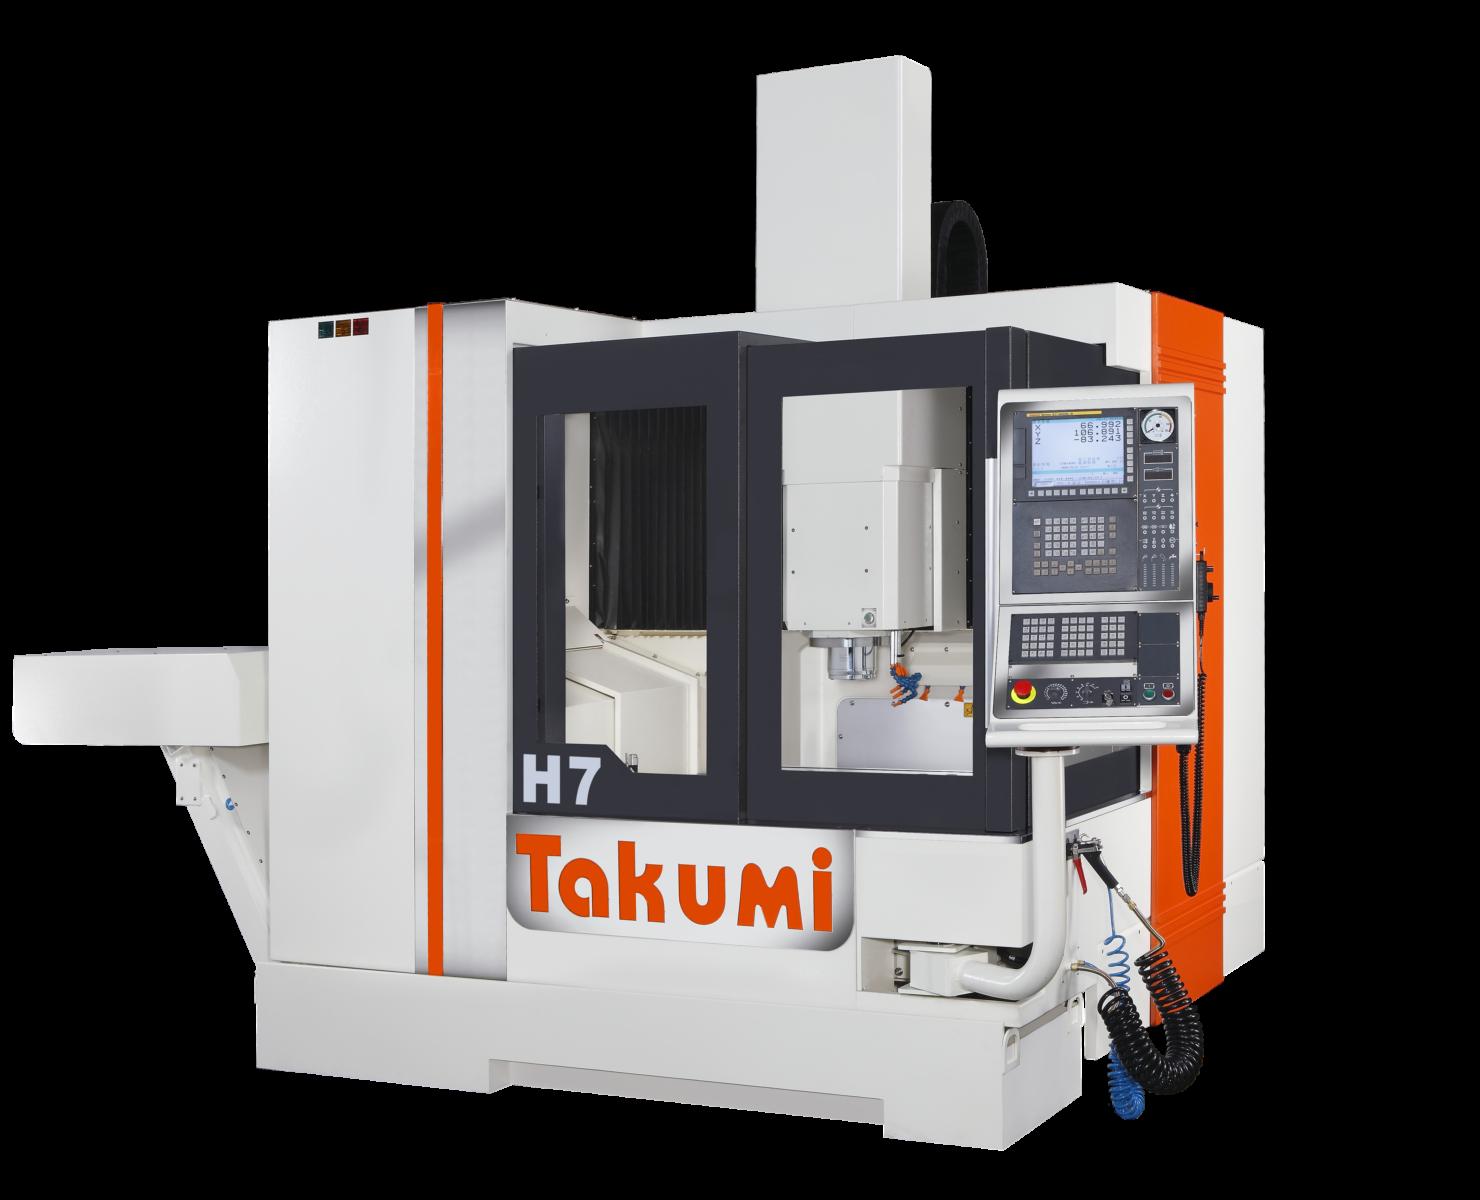 Takumi H7: 3-osiowe centrum obróbkowe z Heidenhain Control for Die & Mold.